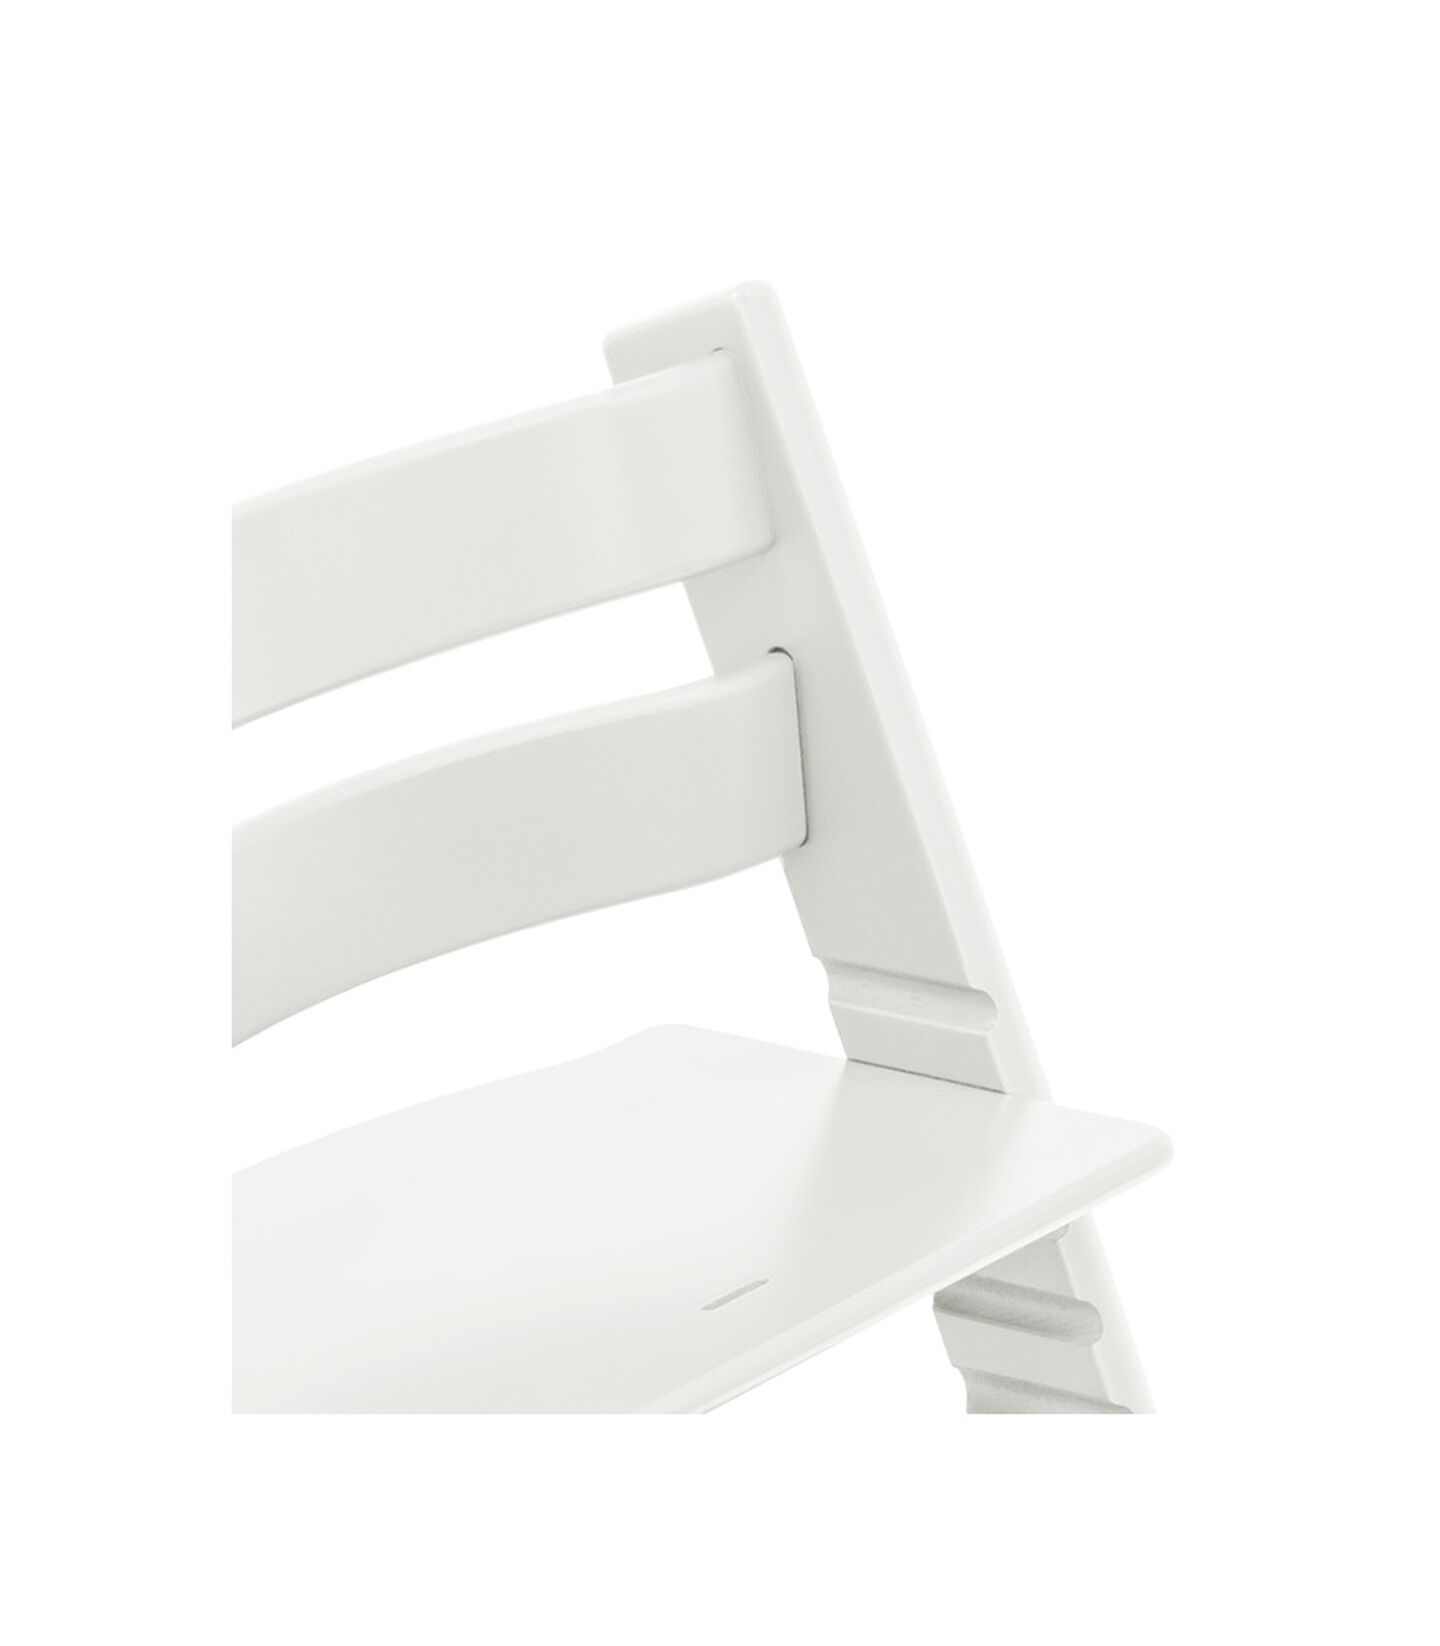 Tripp Trapp® Chair close up photo White view 2